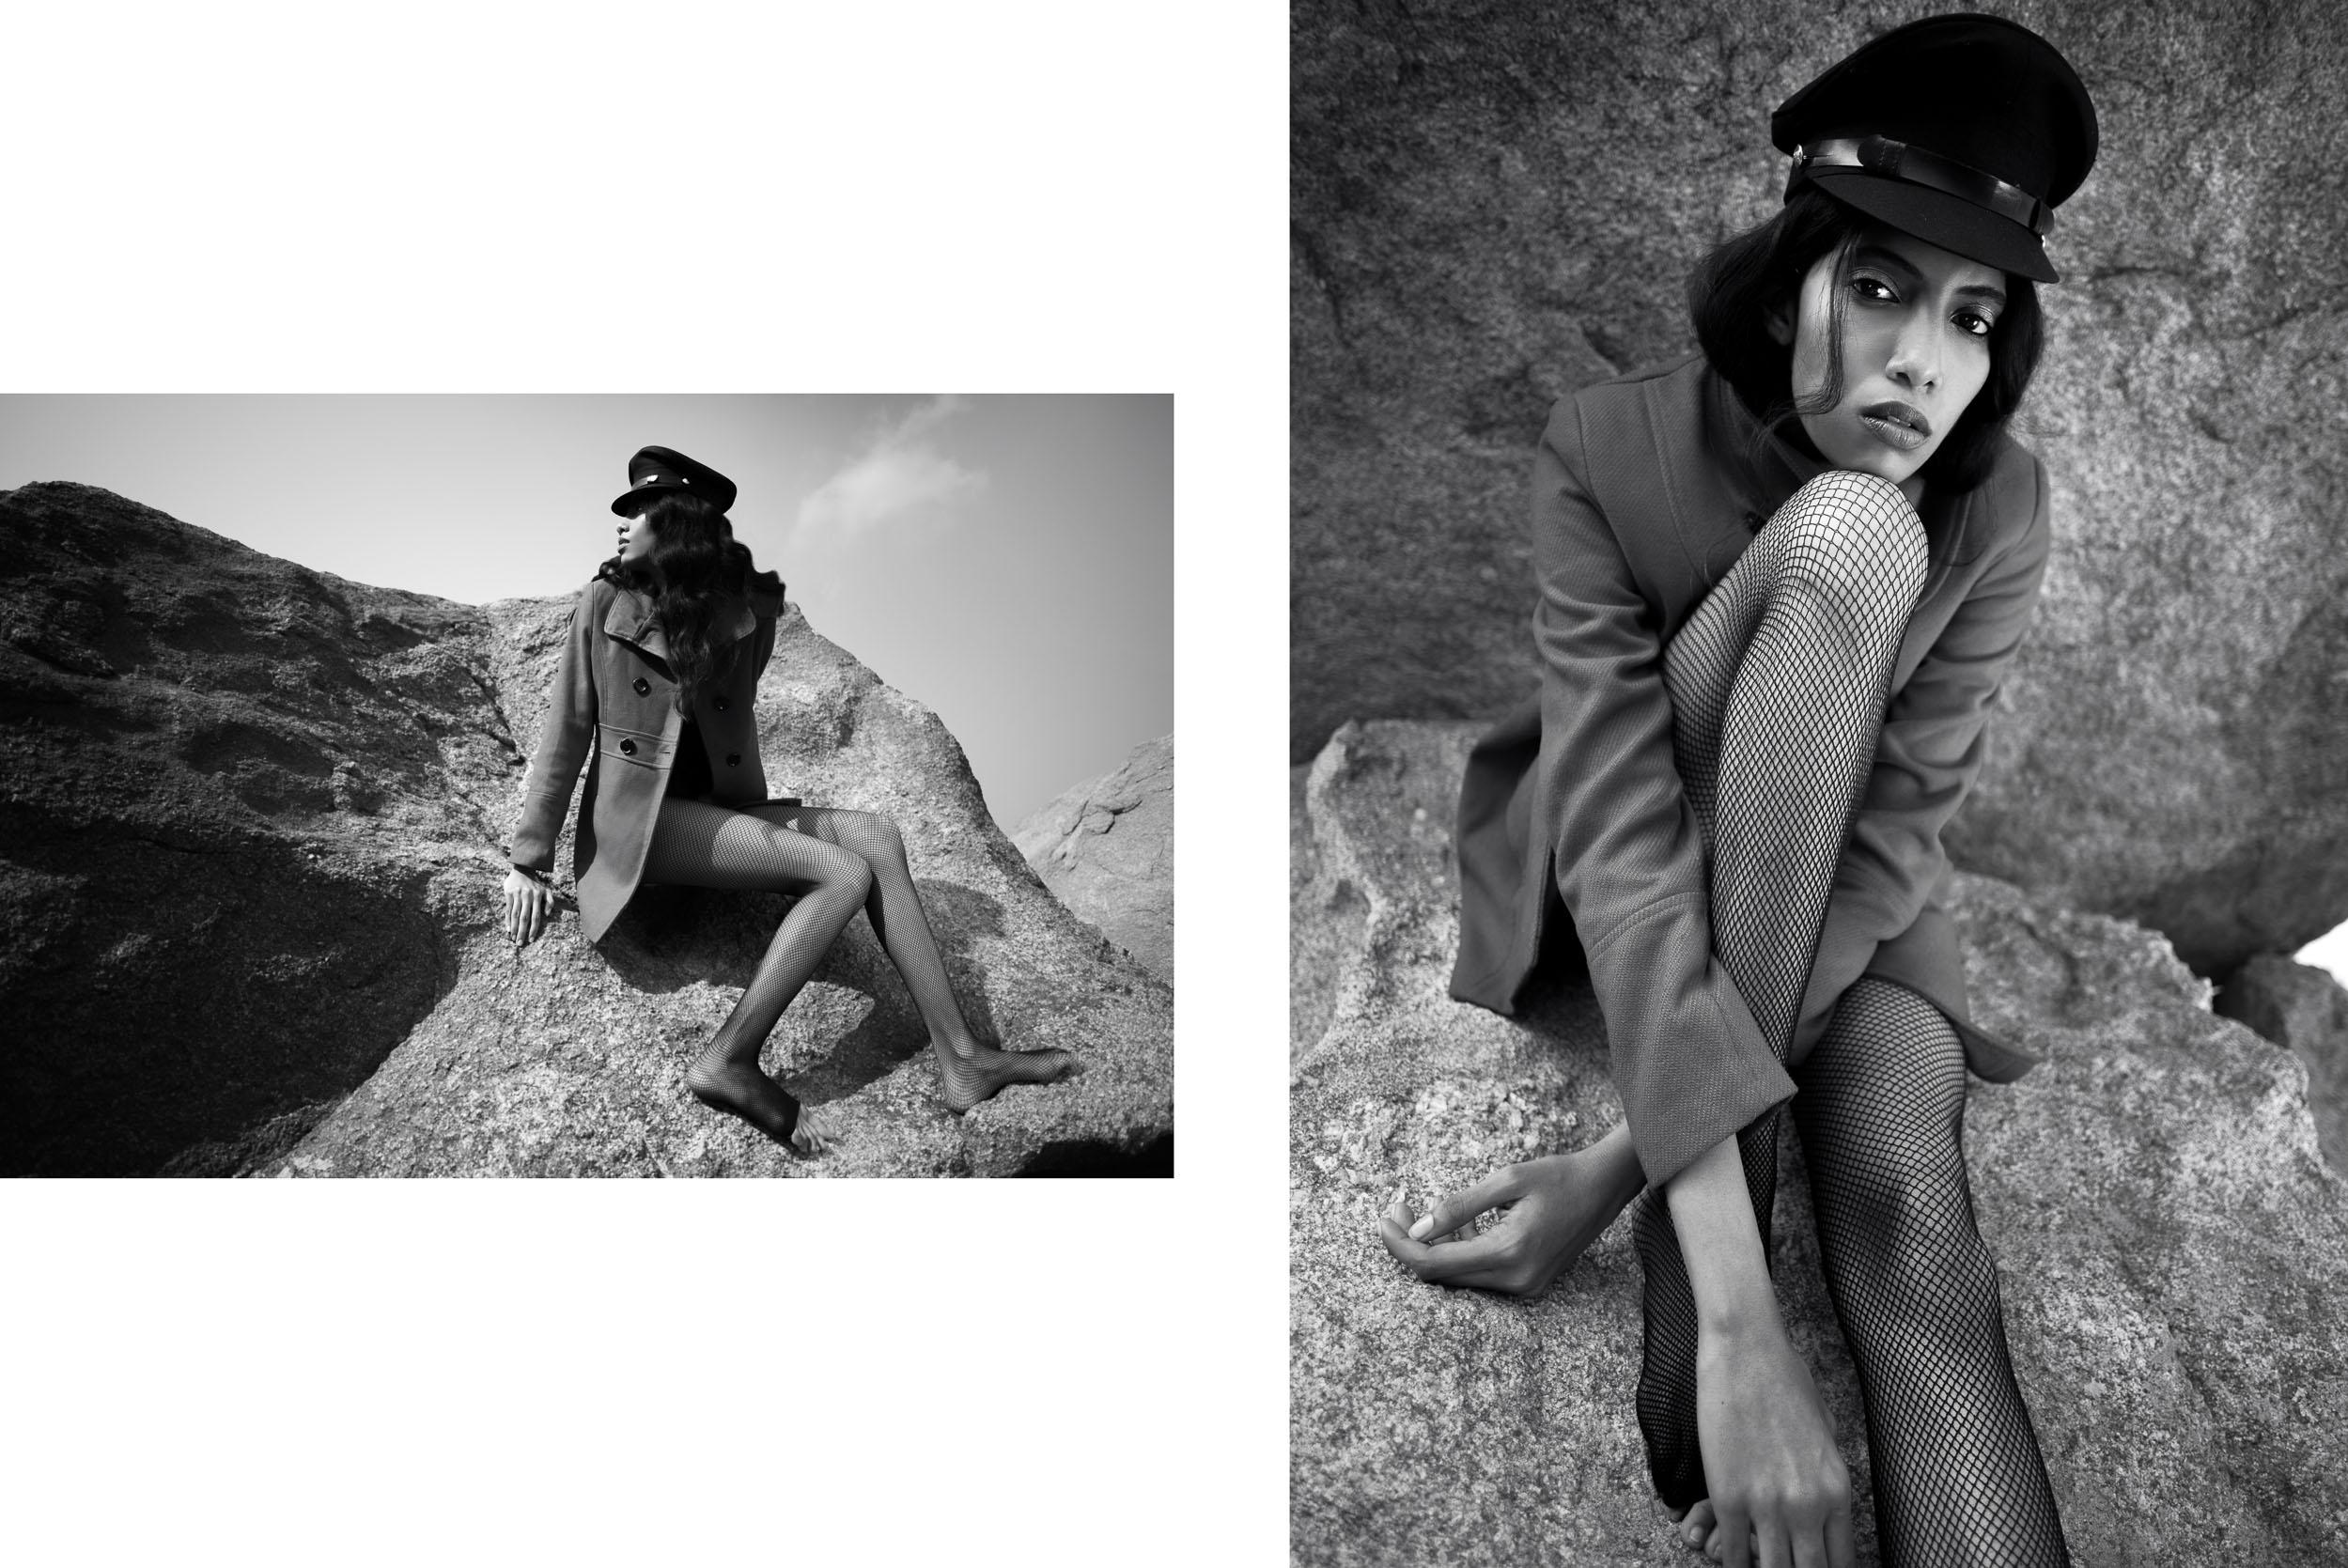 Sindhur_Photography_Fashion_Editorial 10.JPG